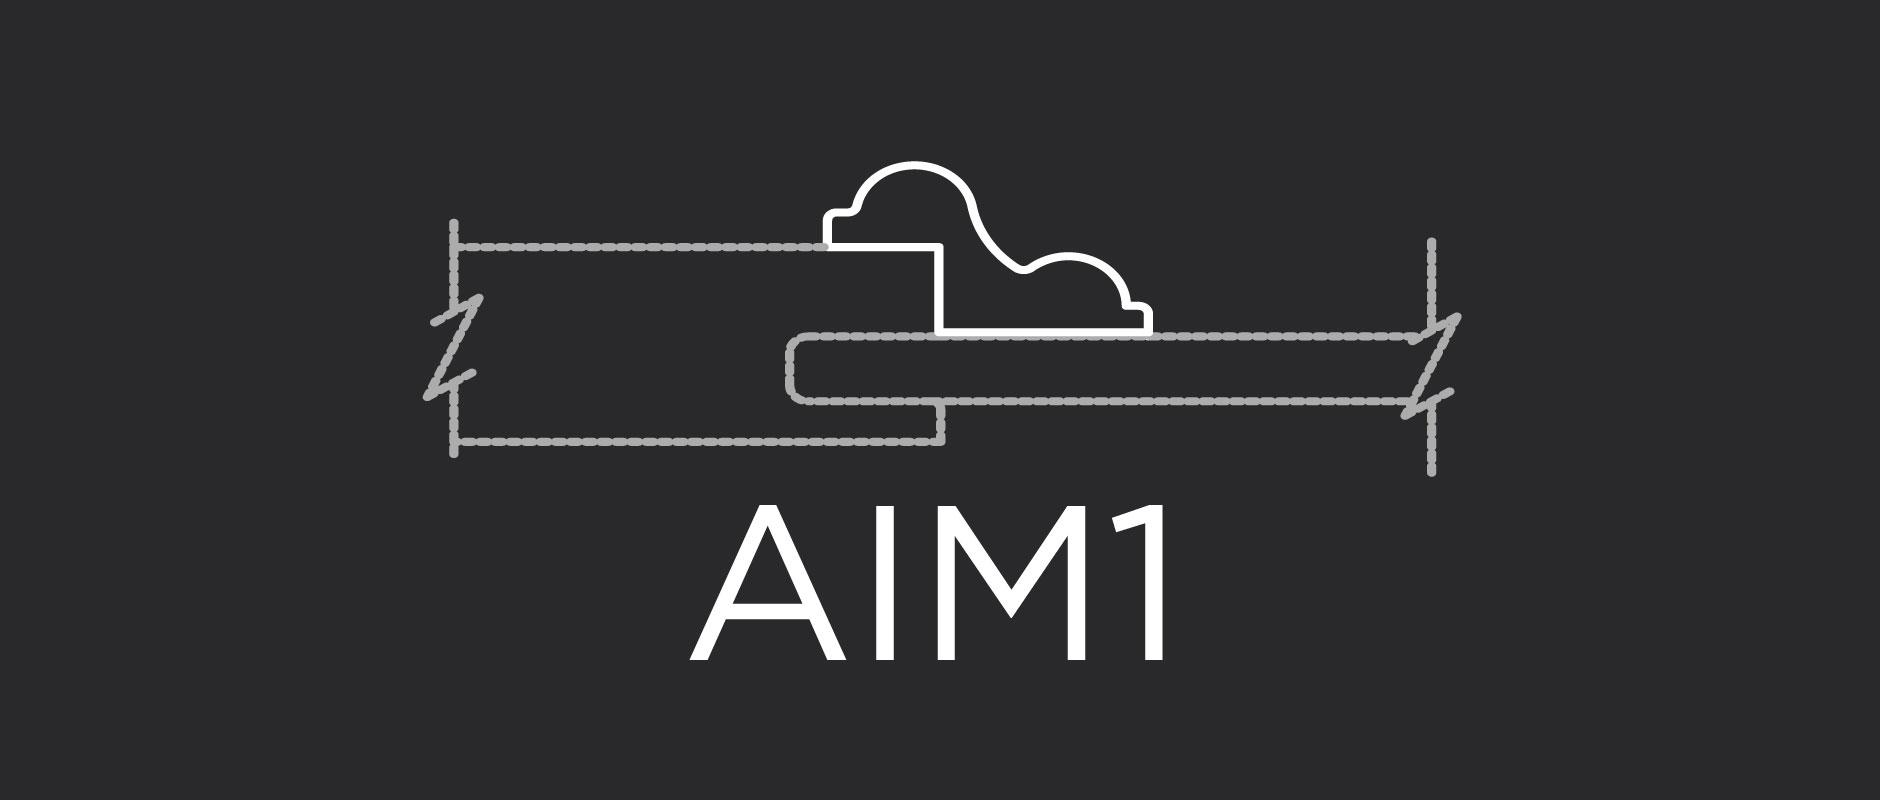 AIM1 inside-edge applied molding